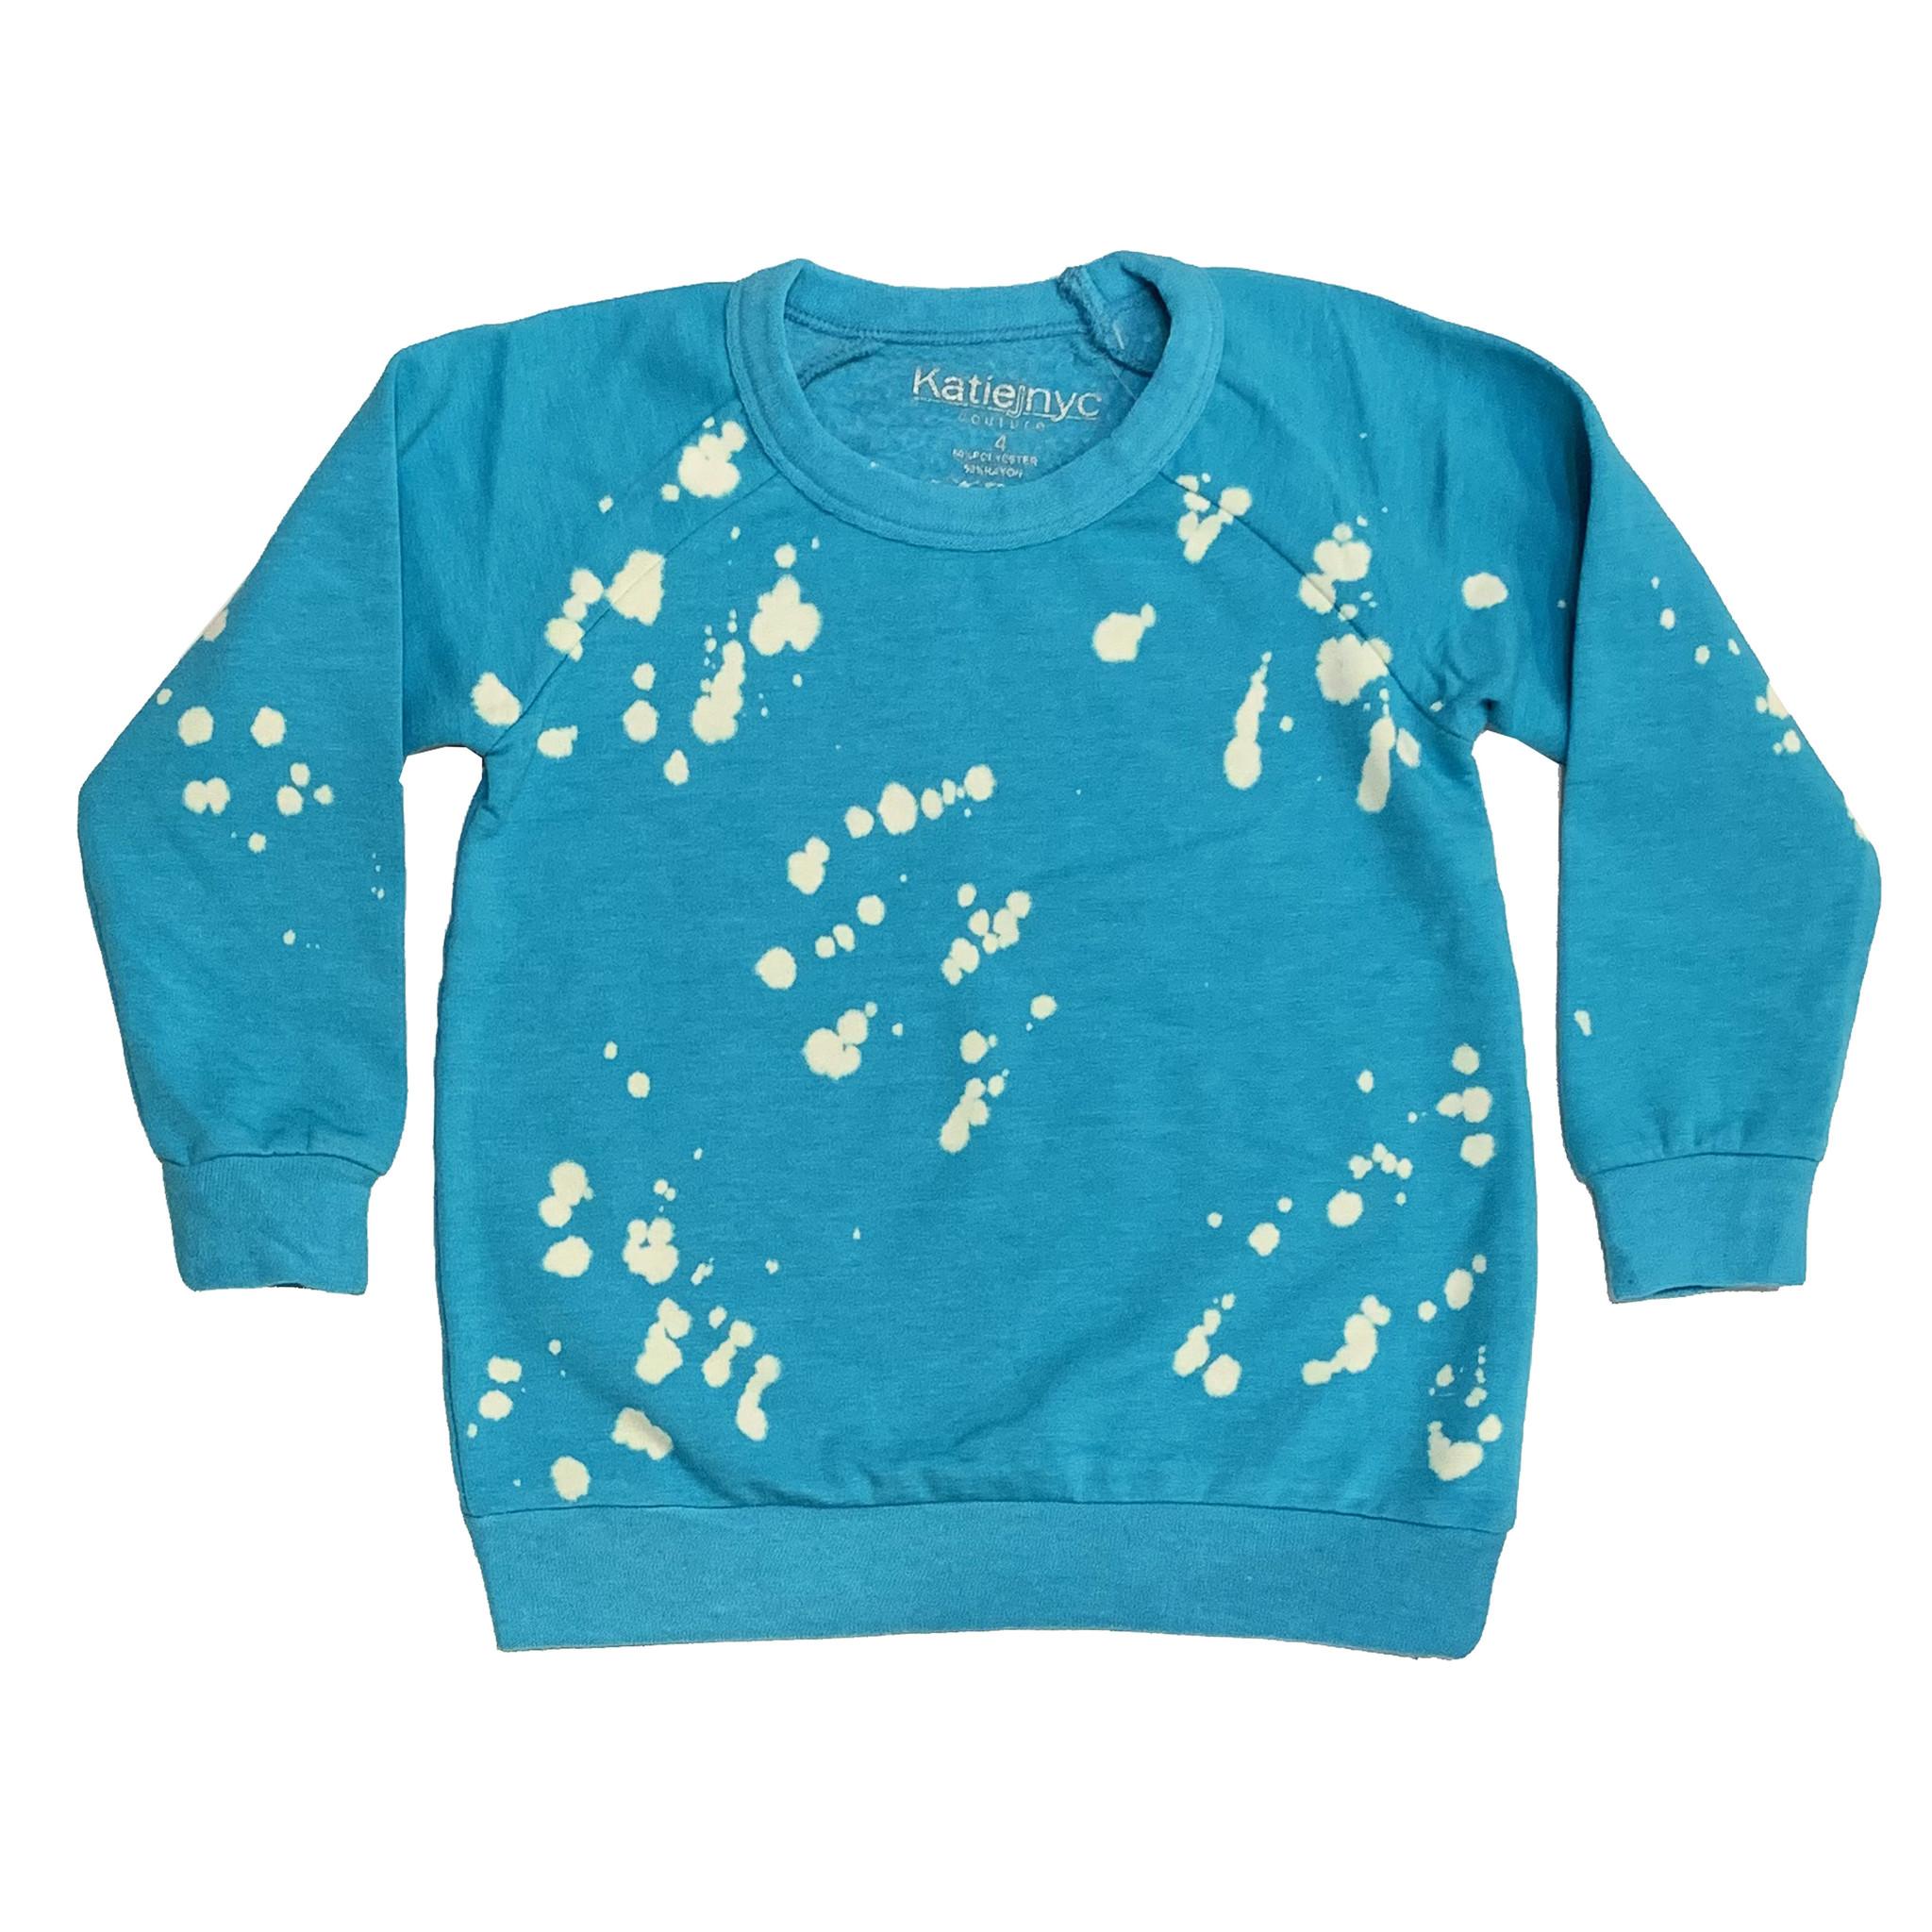 Katie J Turquoise Bleach Splatter Sweatshirt